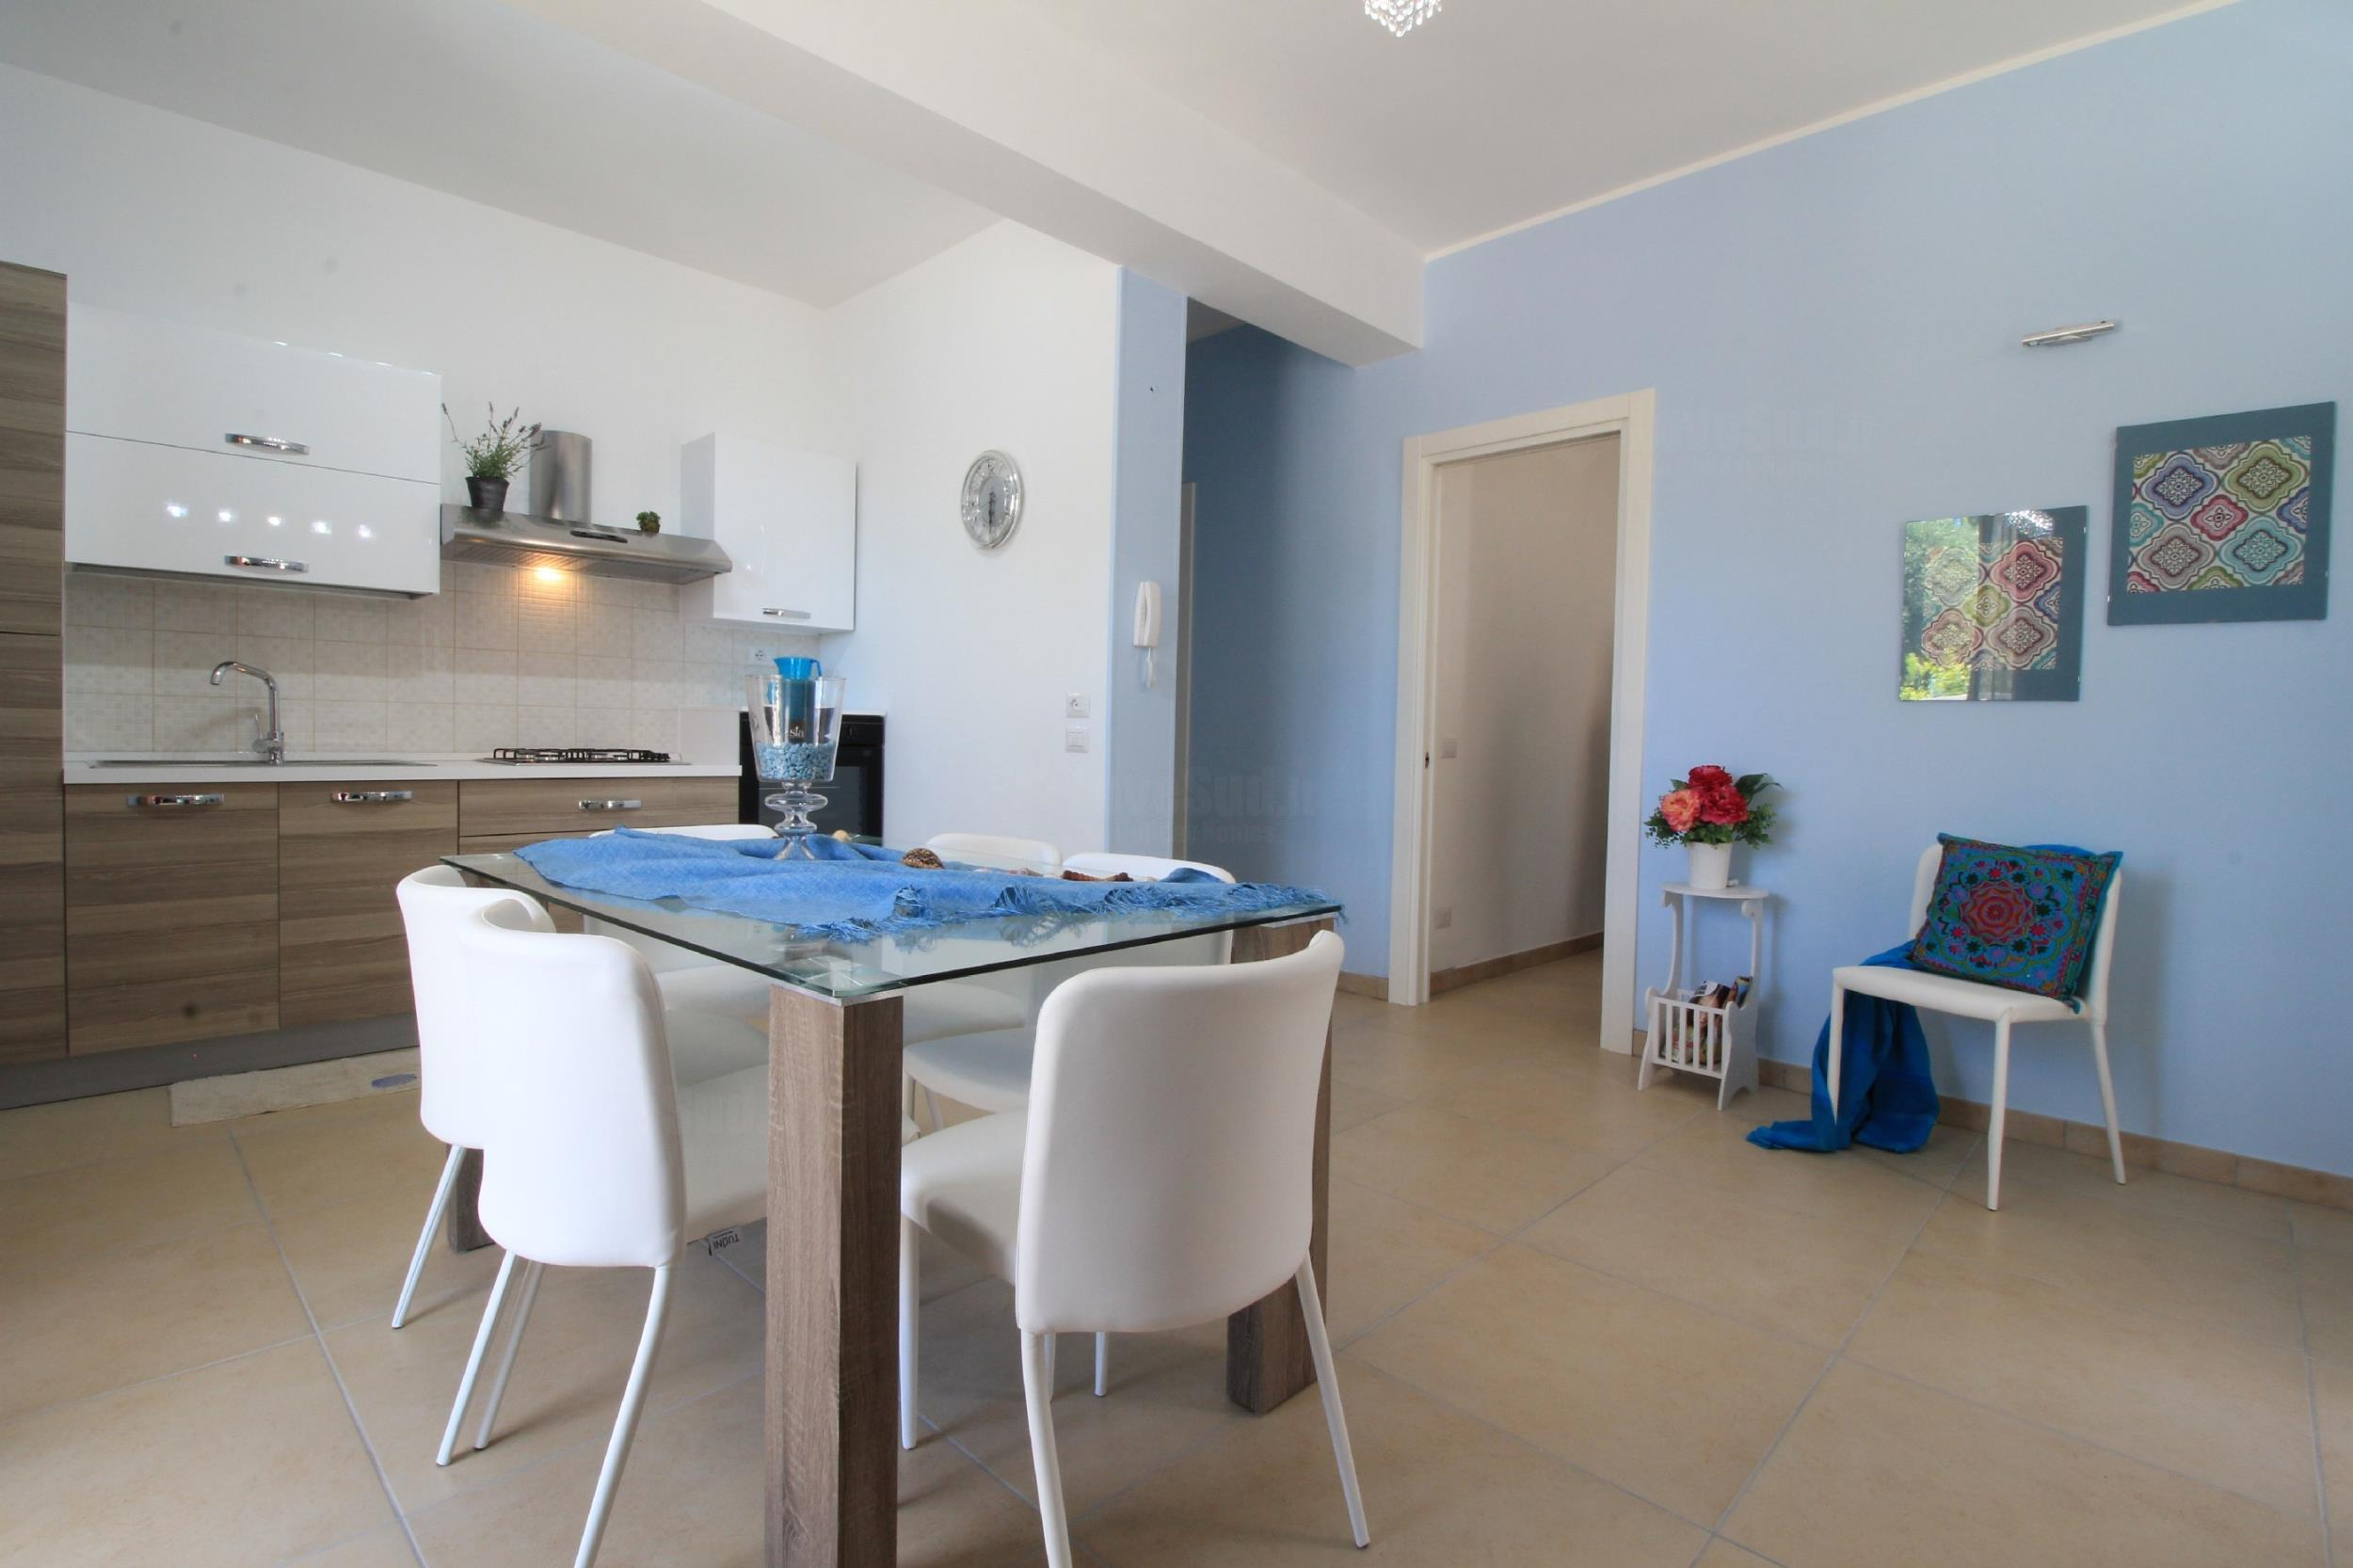 Apartment Elcisia luxe beach house photo 23457097